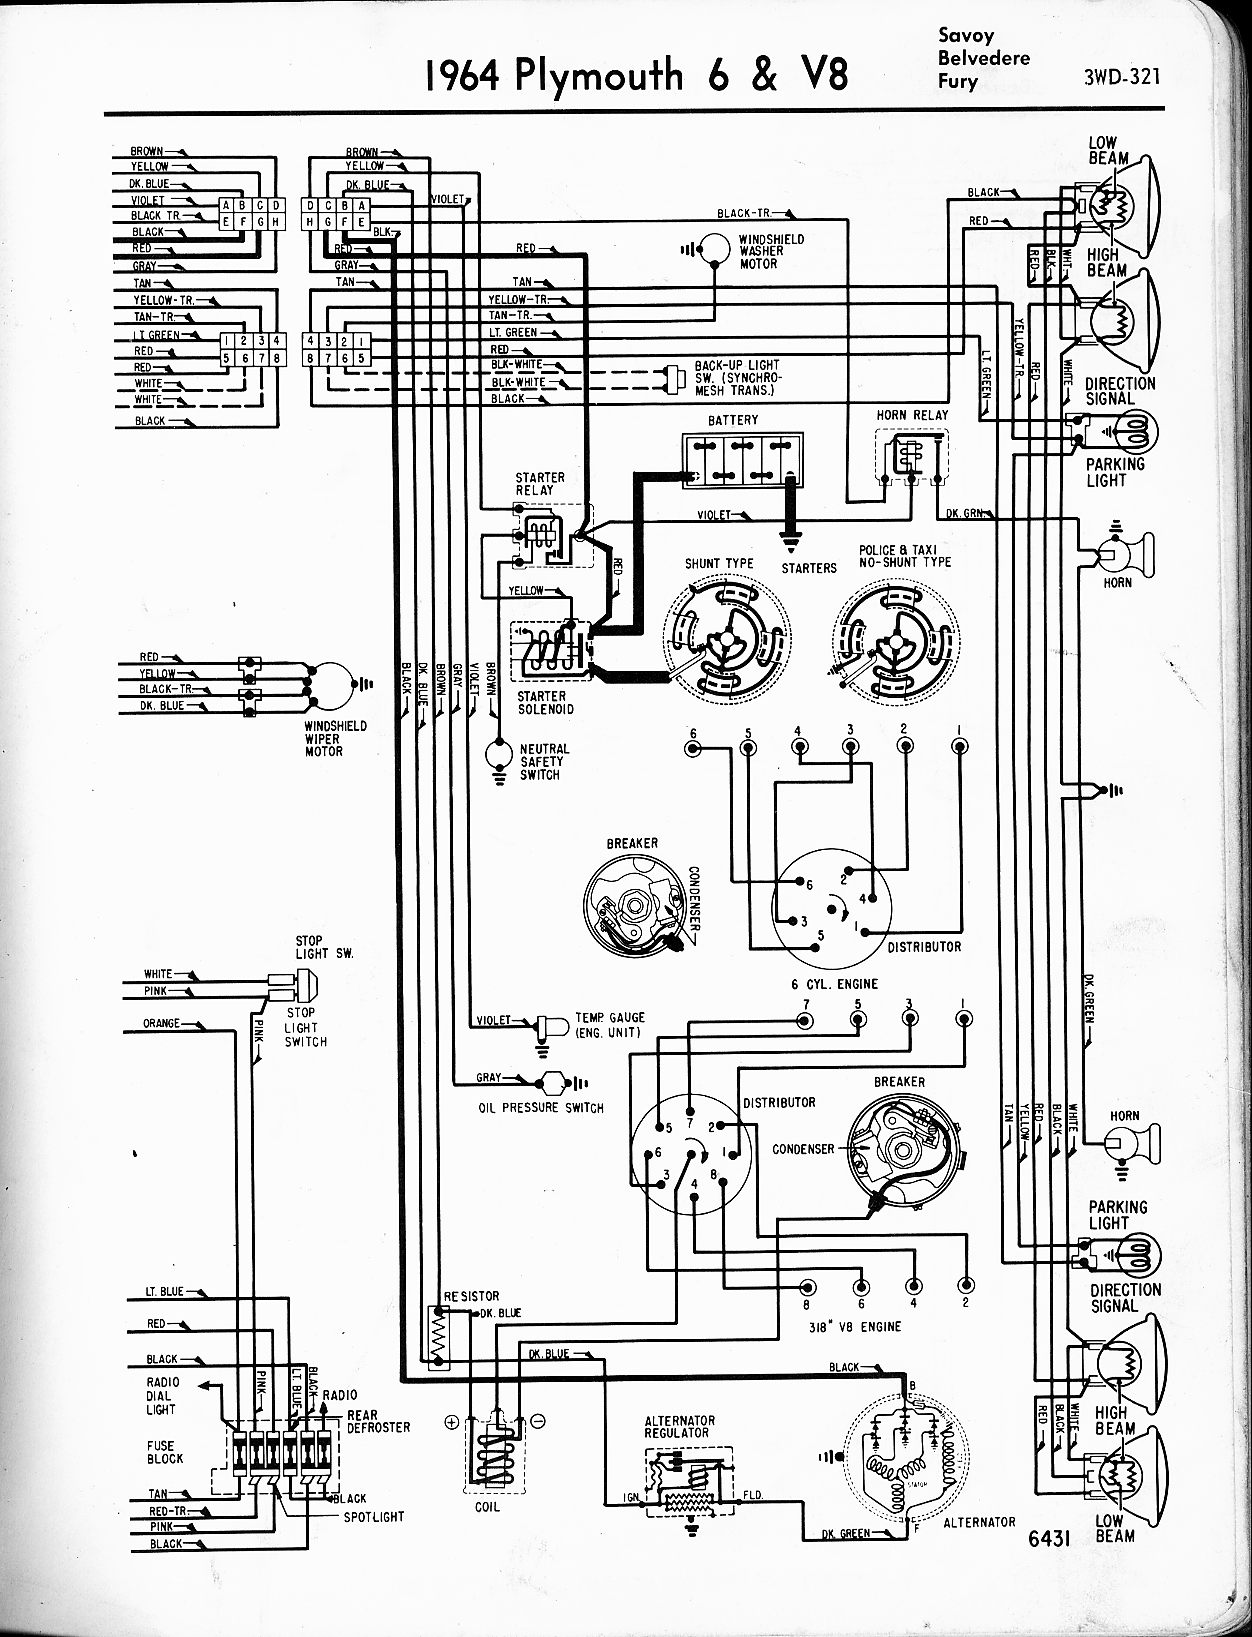 Wondrous 63 Plymouth Wiring Diagram Basic Electronics Wiring Diagram Wiring Cloud Mousmenurrecoveryedborg